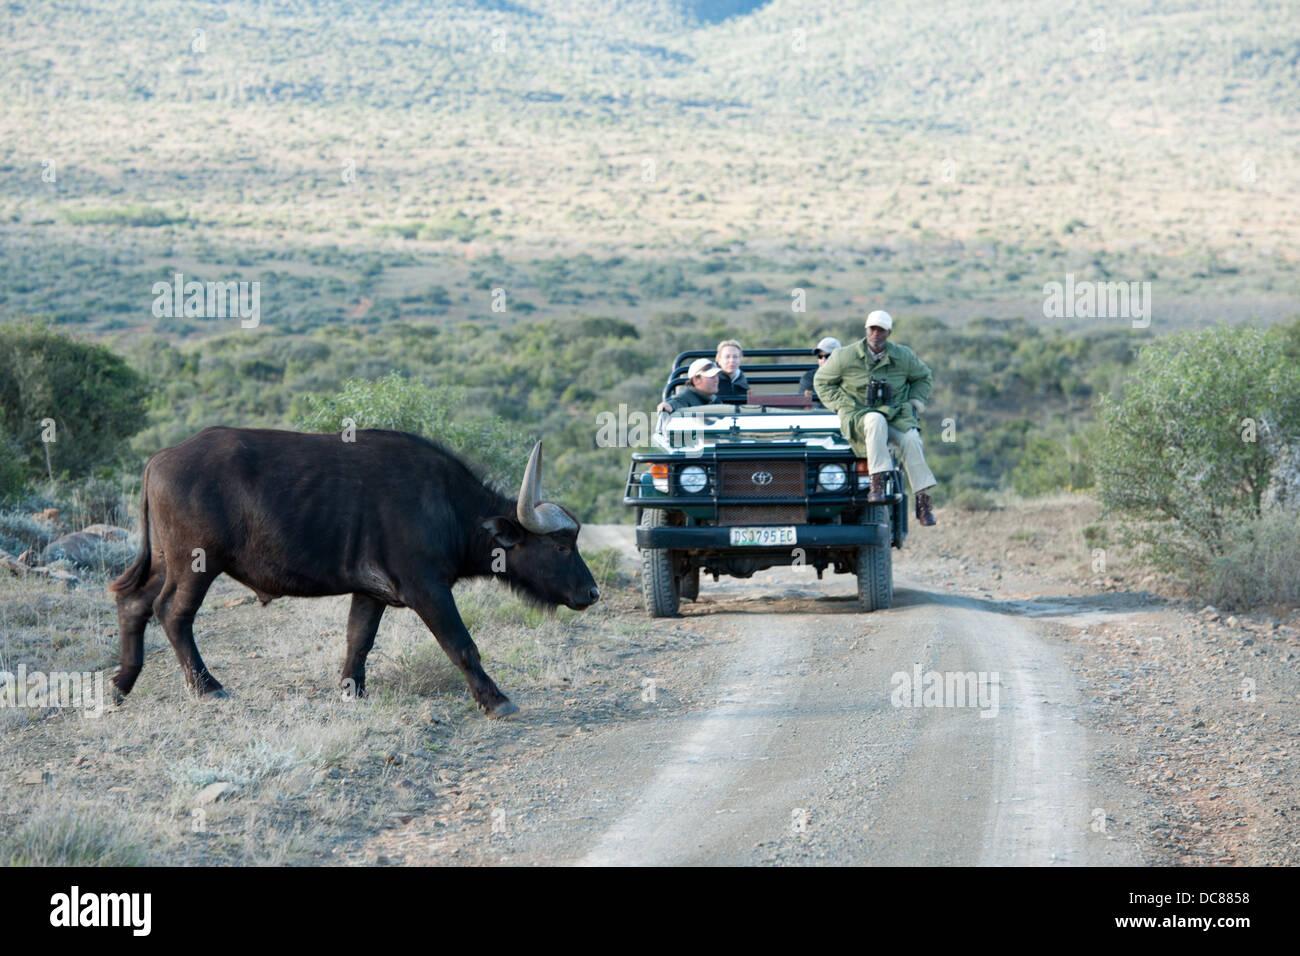 Buffalo (Syncerus caffer caffer) and safari vehicle, Kwandwe Game Reserve, South Africa - Stock Image